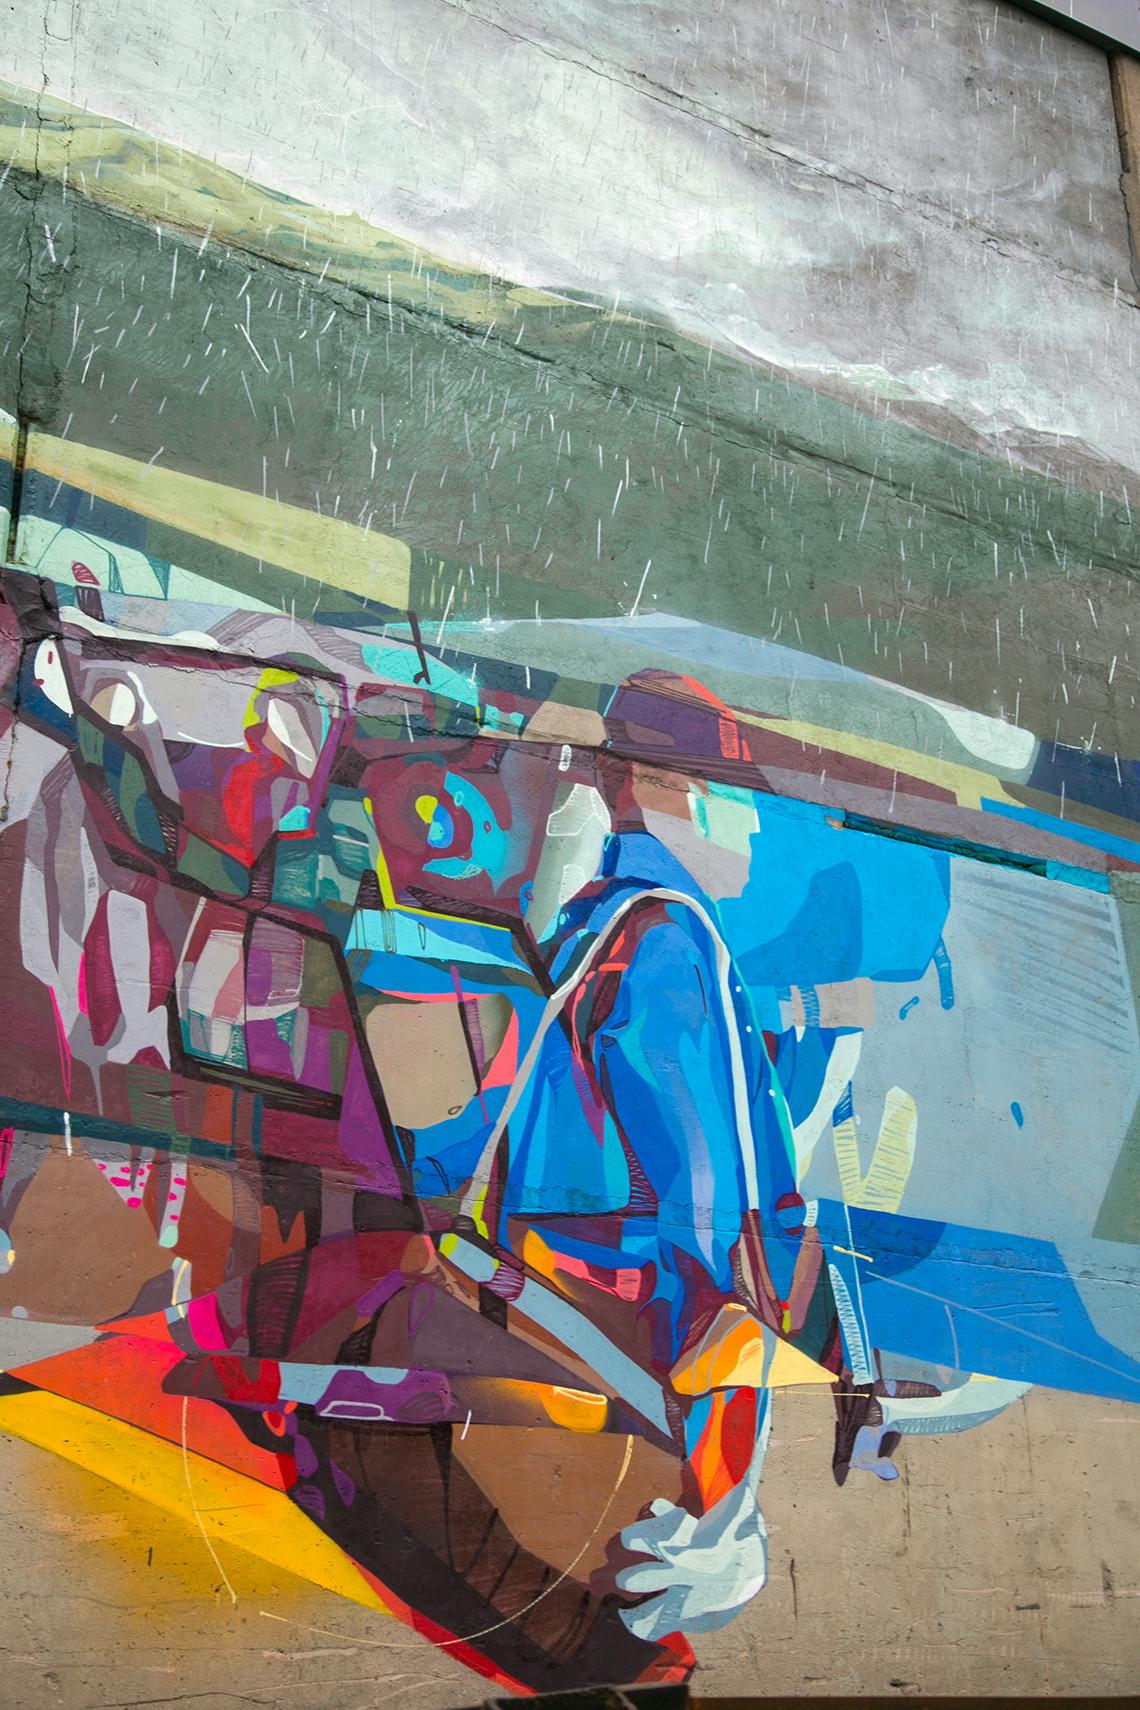 akue-retreat-new-mural-in-st-petersburg-07